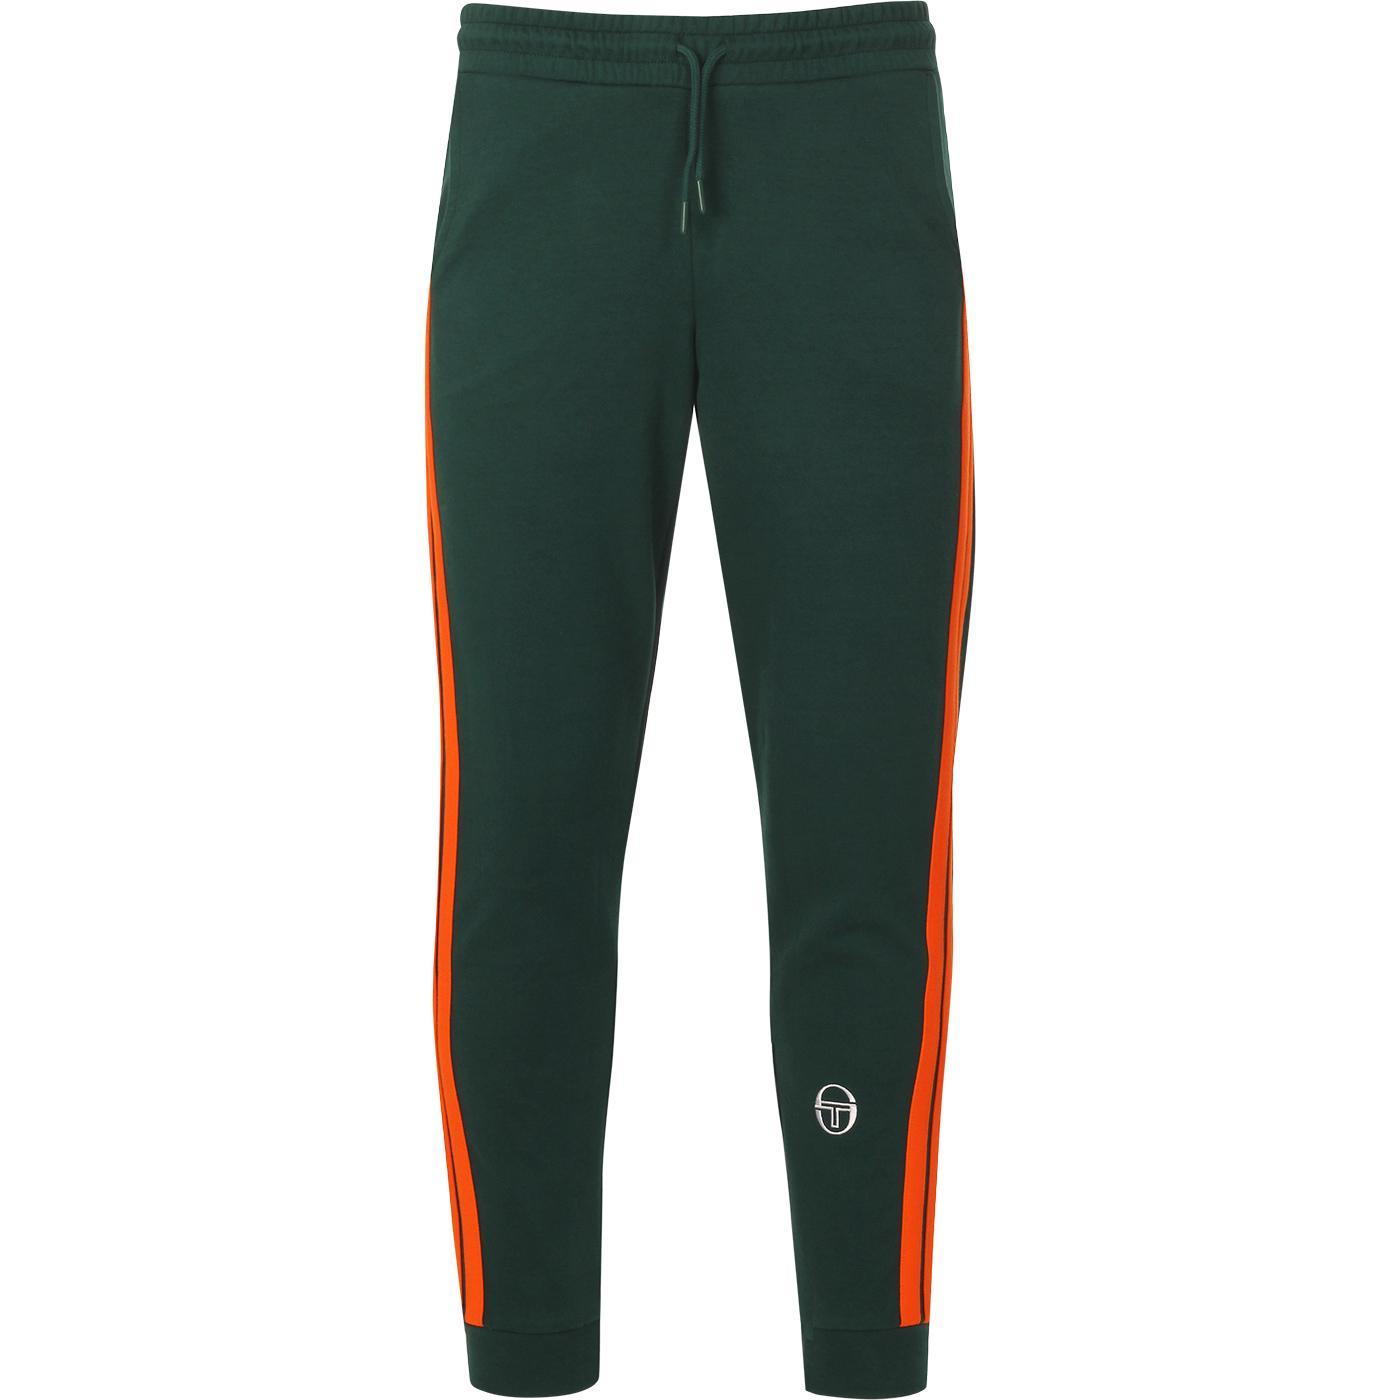 Grado SERGIO TACCHINI Stripe Jersey Track Pants BG